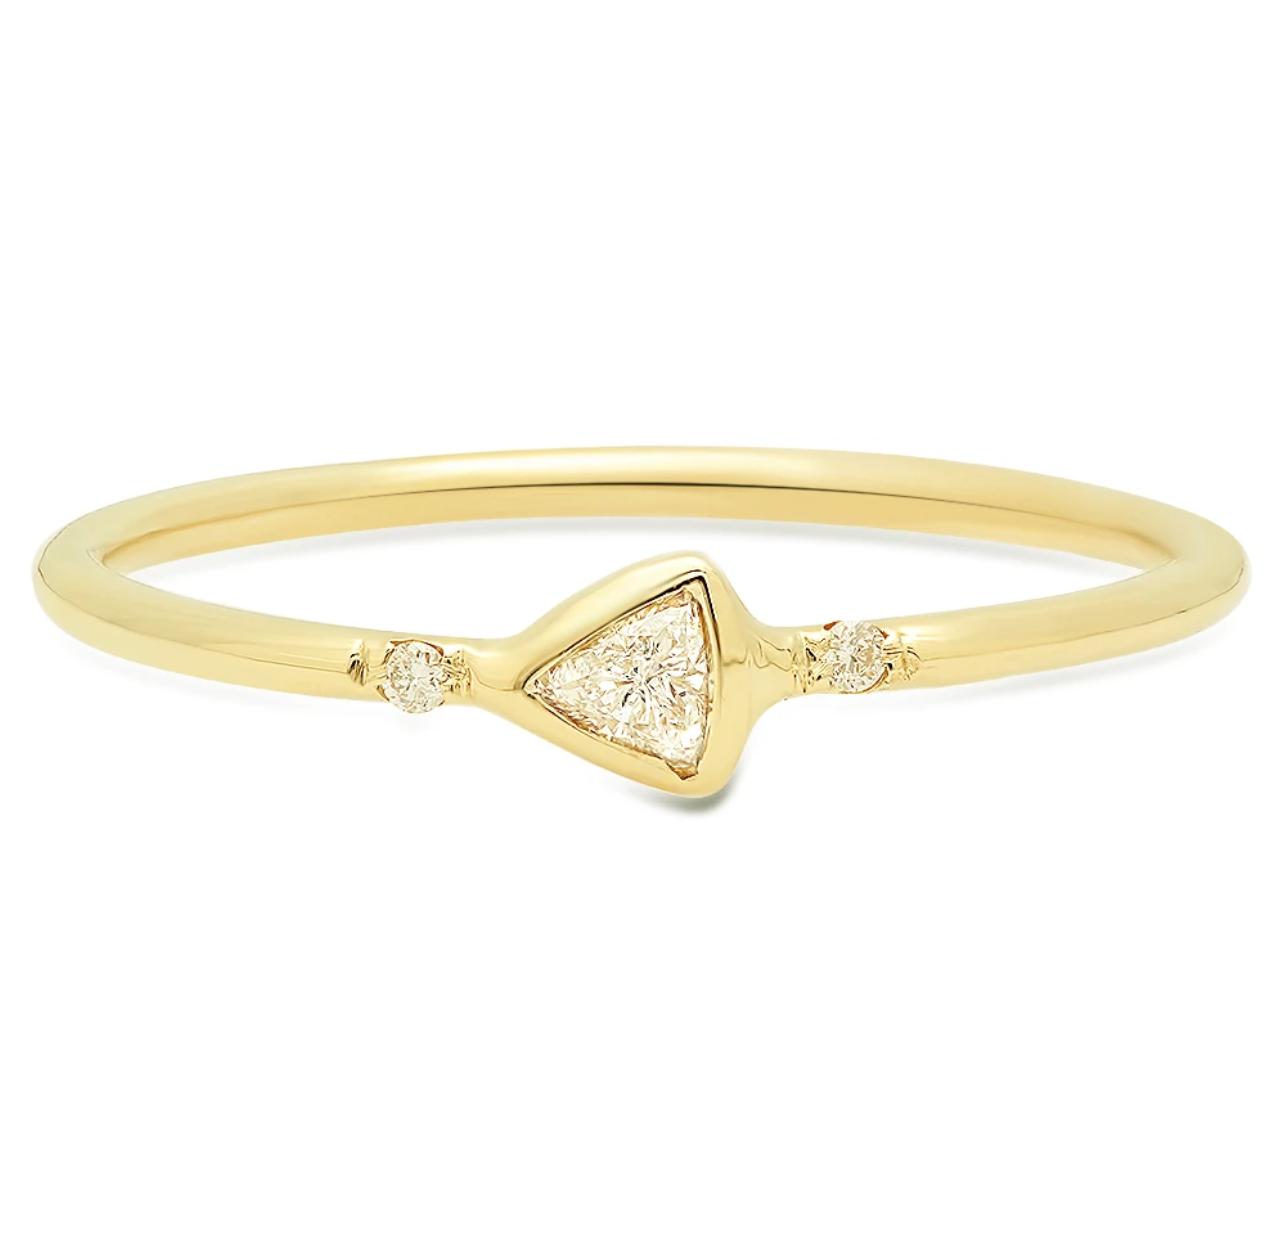 Rosedale Jewelry Petite Trillion Diamond Ring